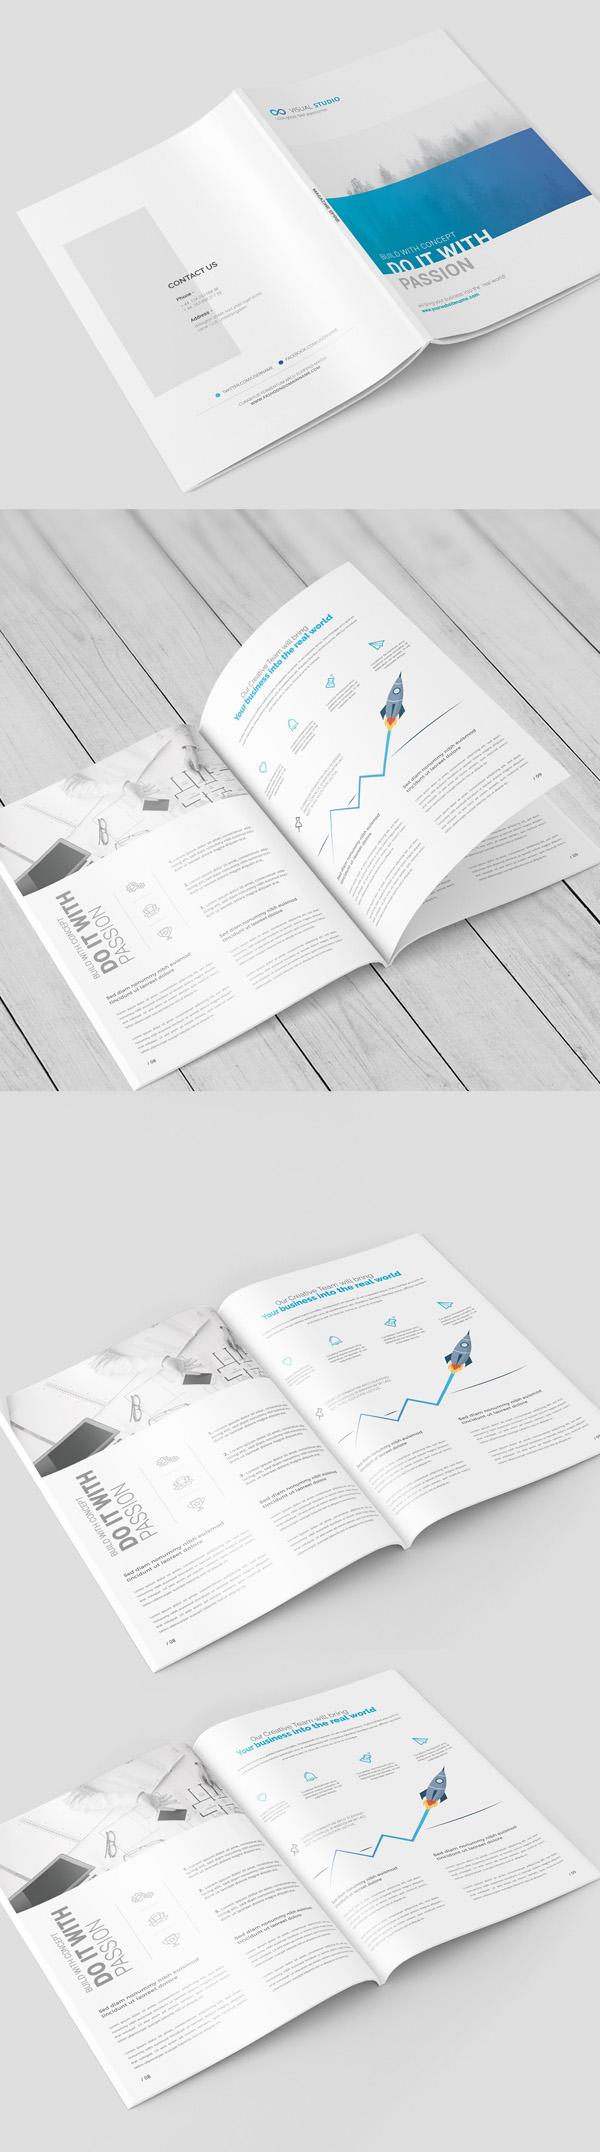 A4 Magazine / Brochure Mock-Up